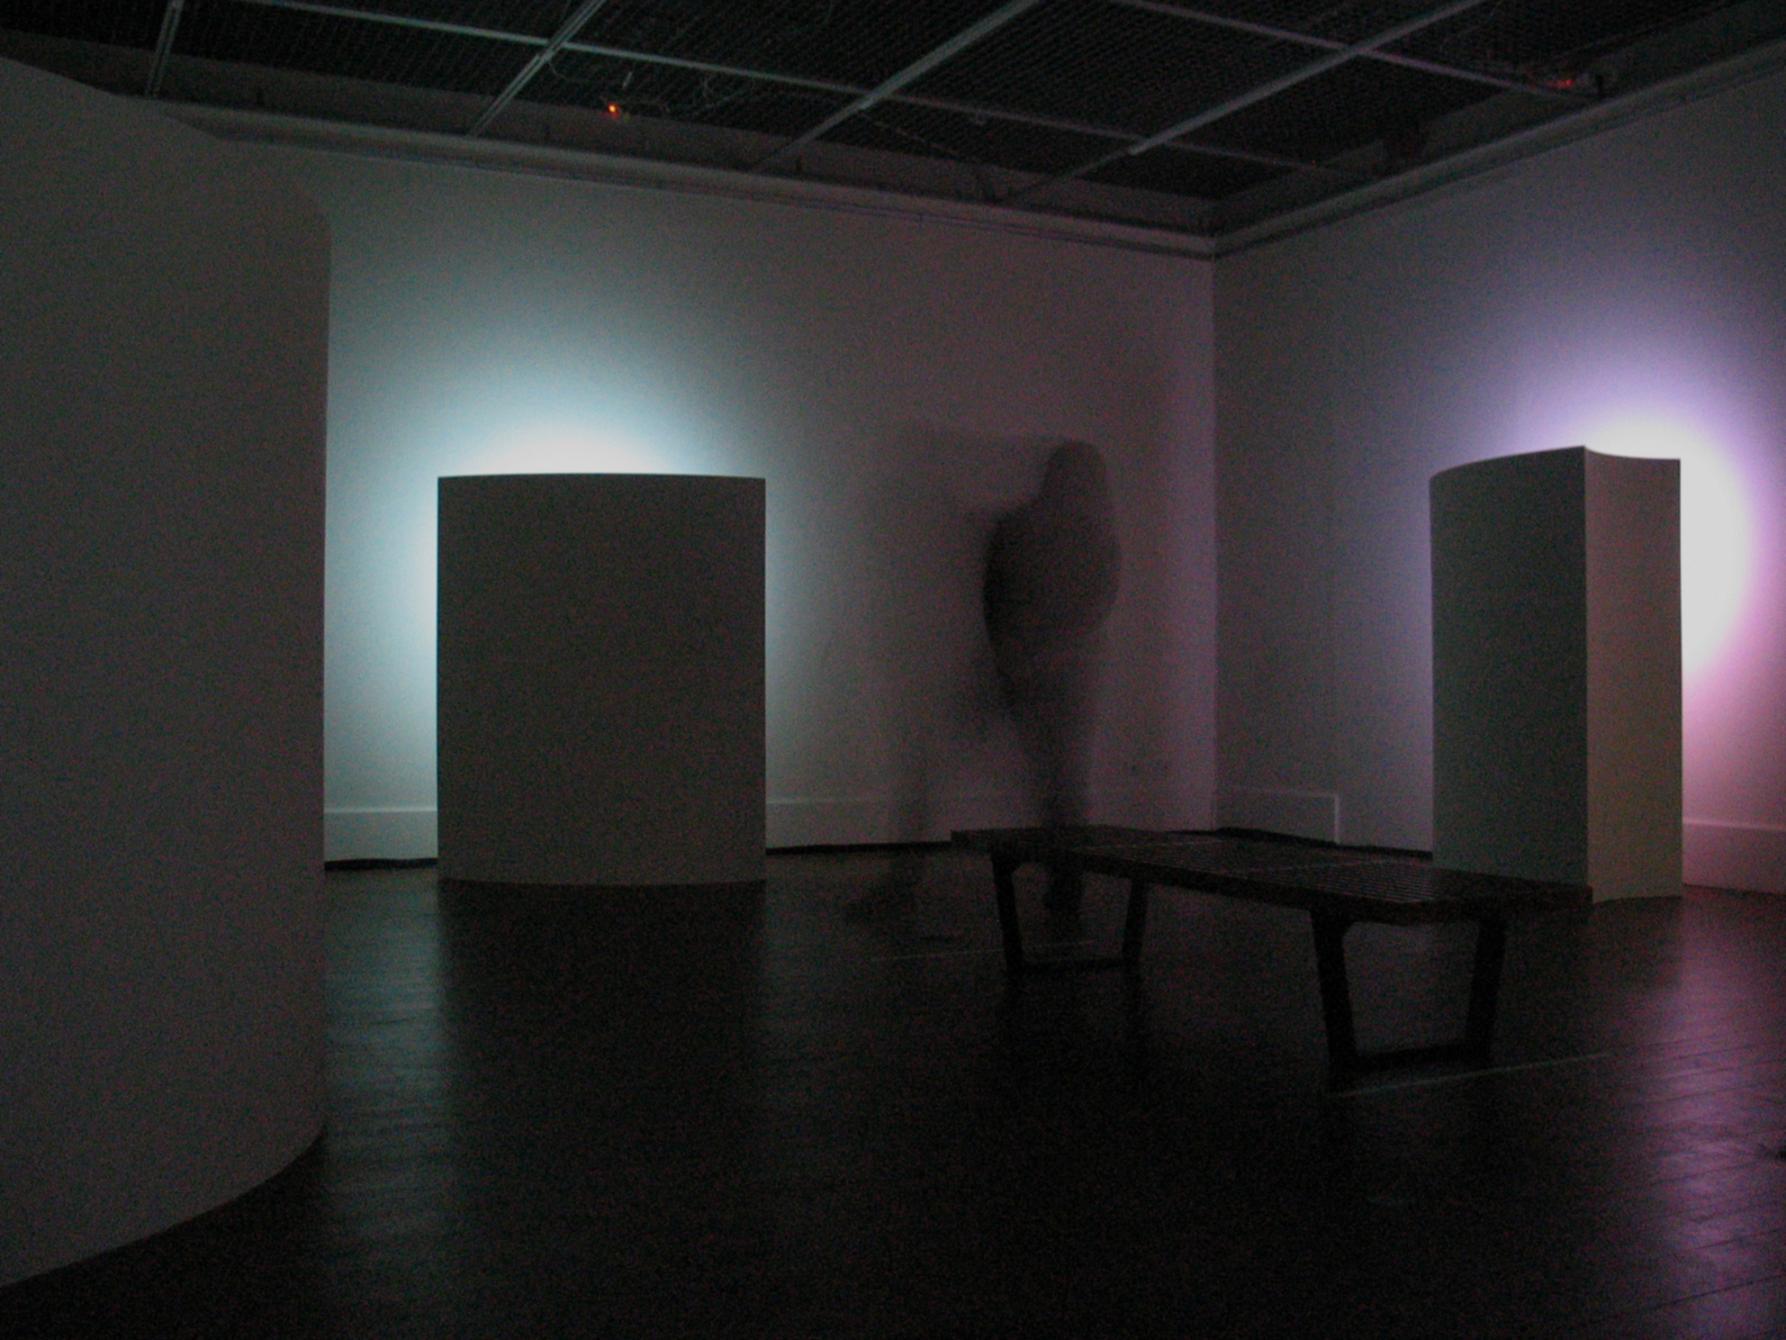 2012-01-12-TheQuartetProject5.jpg